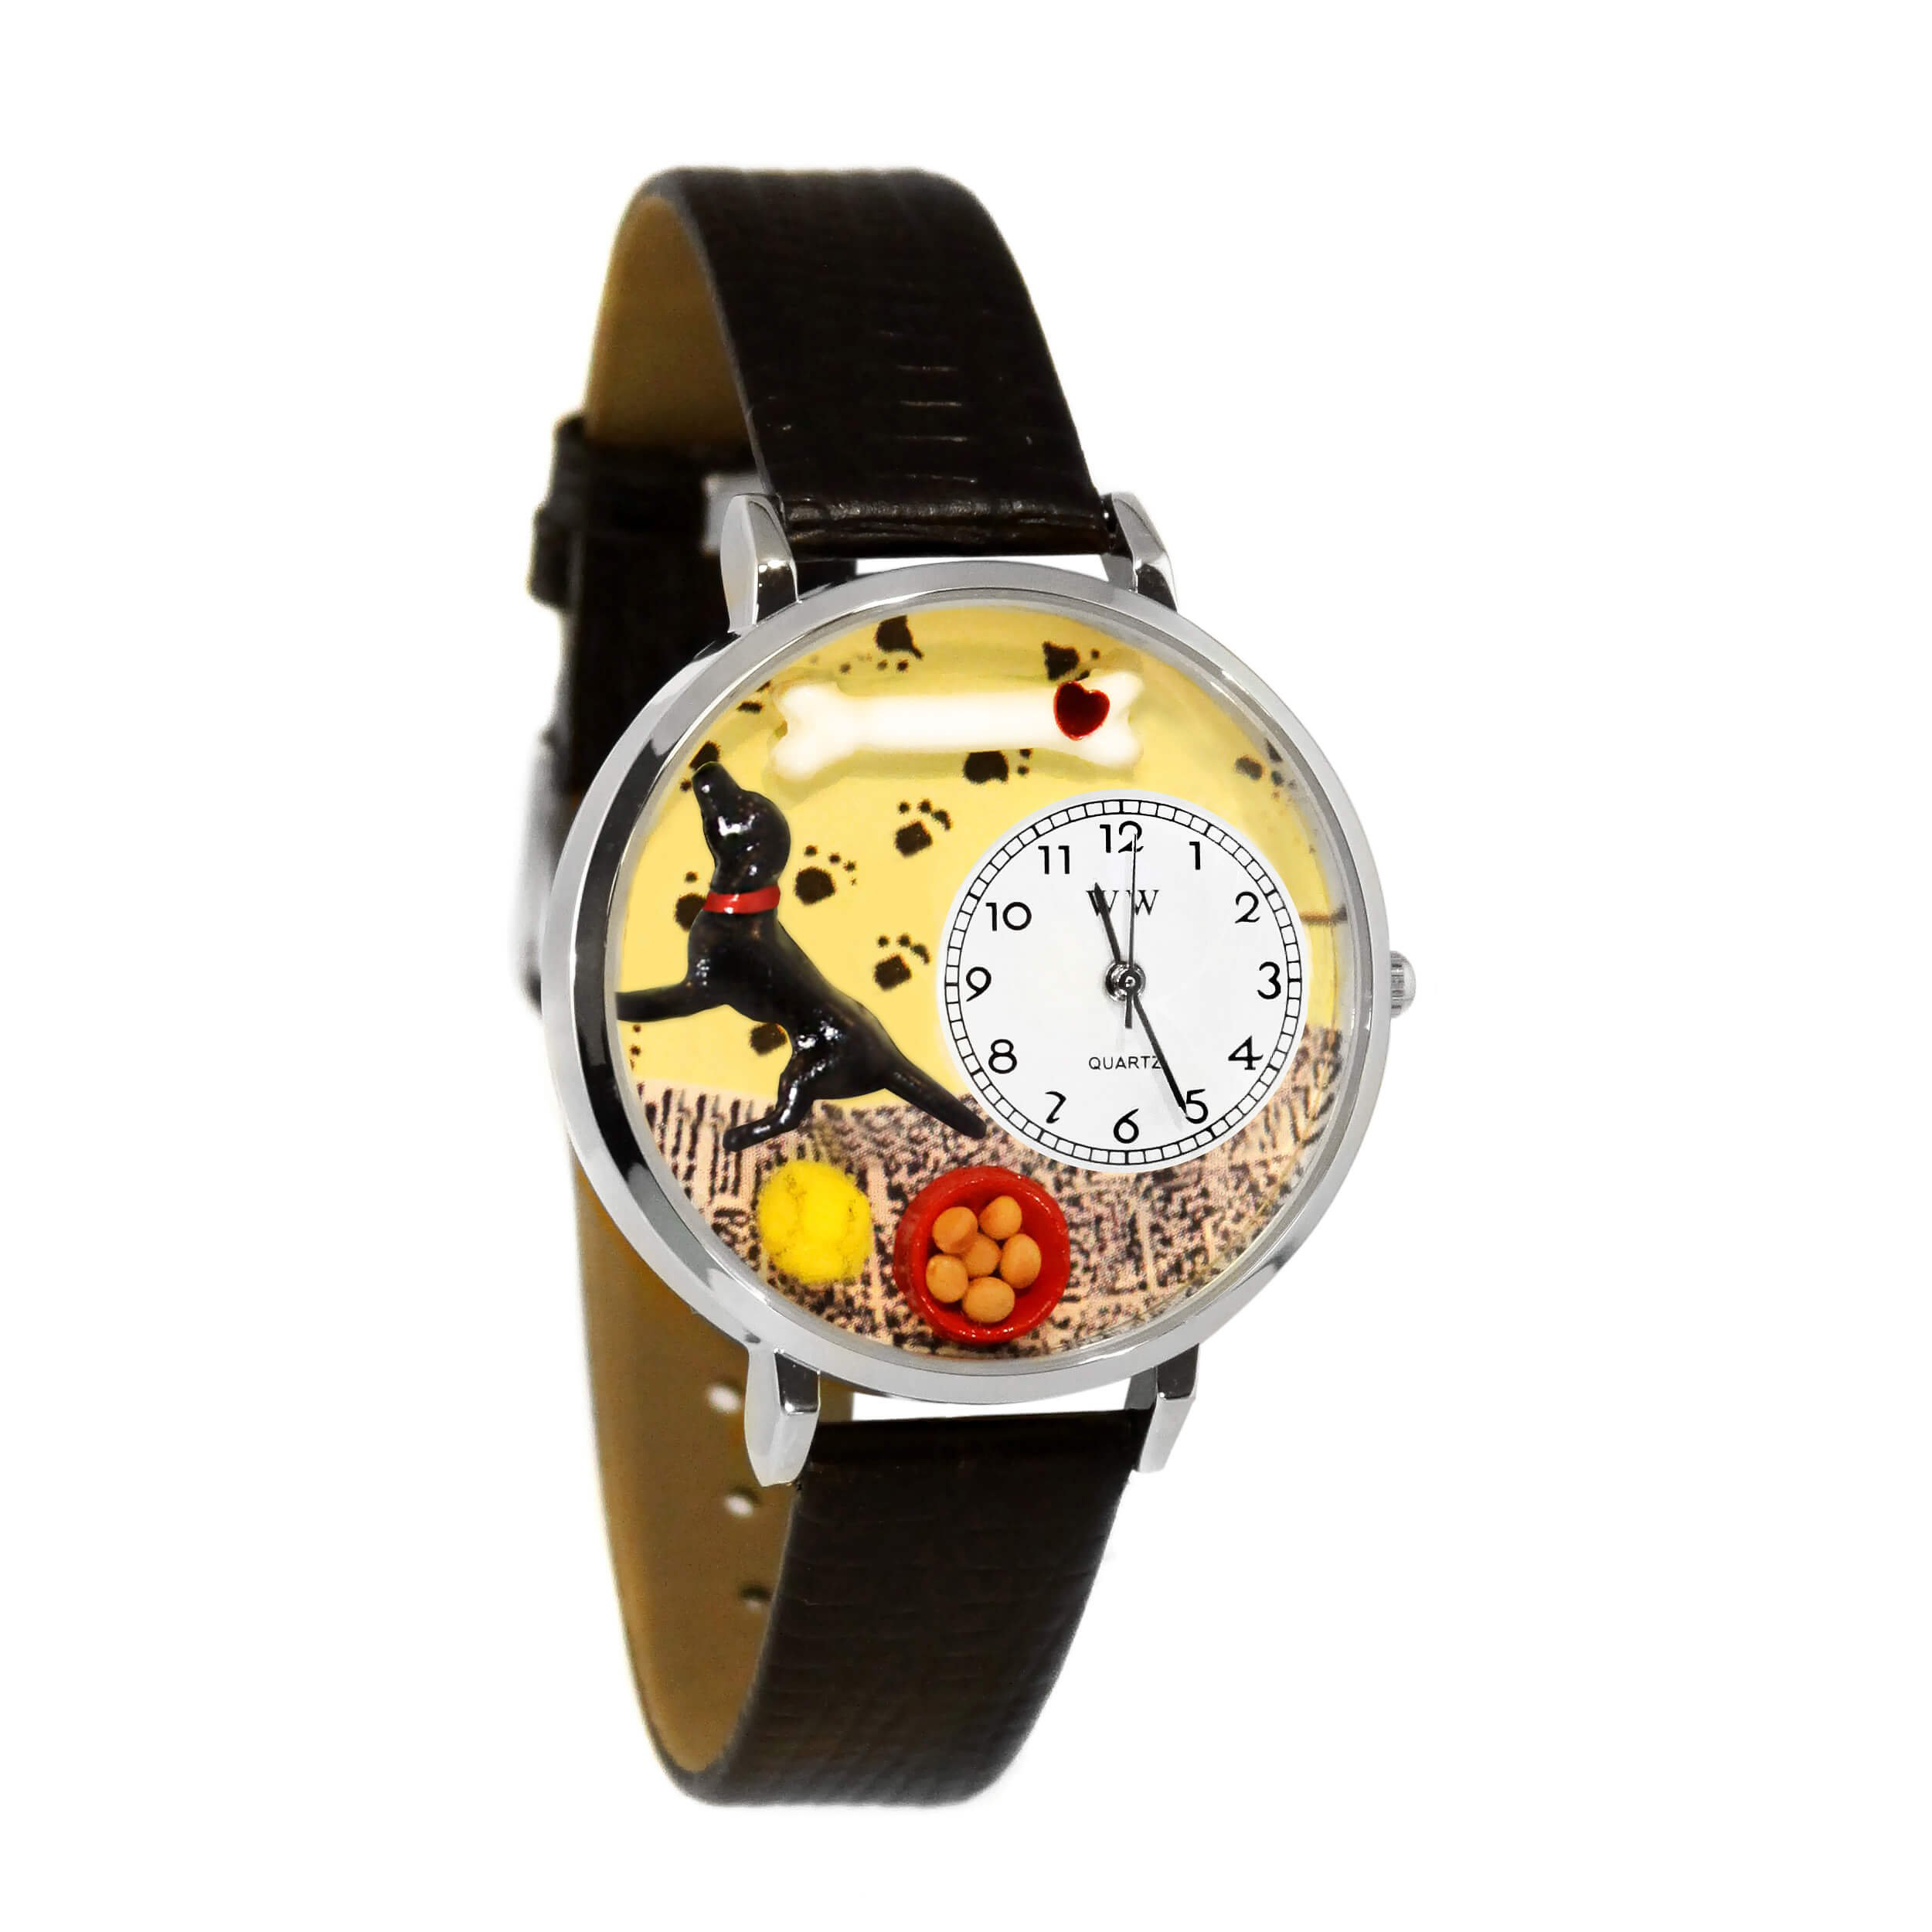 Whimsical Watches Unisex U0130011 Labrador Retriever Black Skin Leather Watch